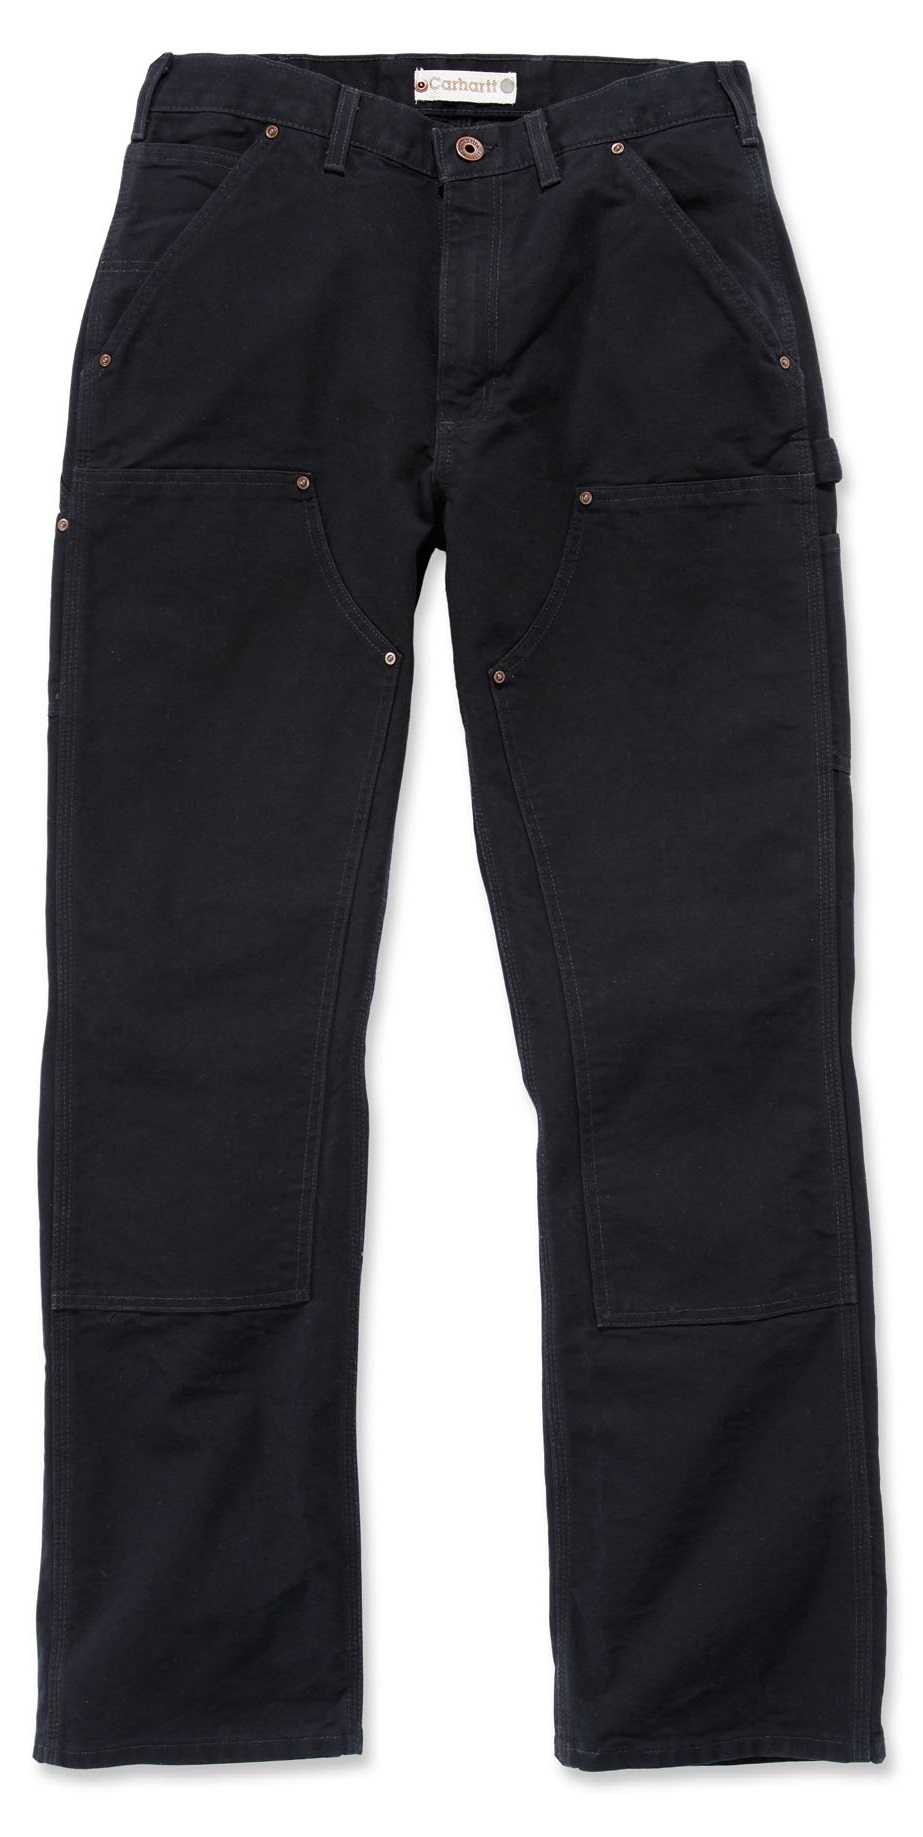 CARHARTT-schwarz-Hose-EB136-doppelte-Front-Knie-Double-Front-Pant-wie-B01-NEU